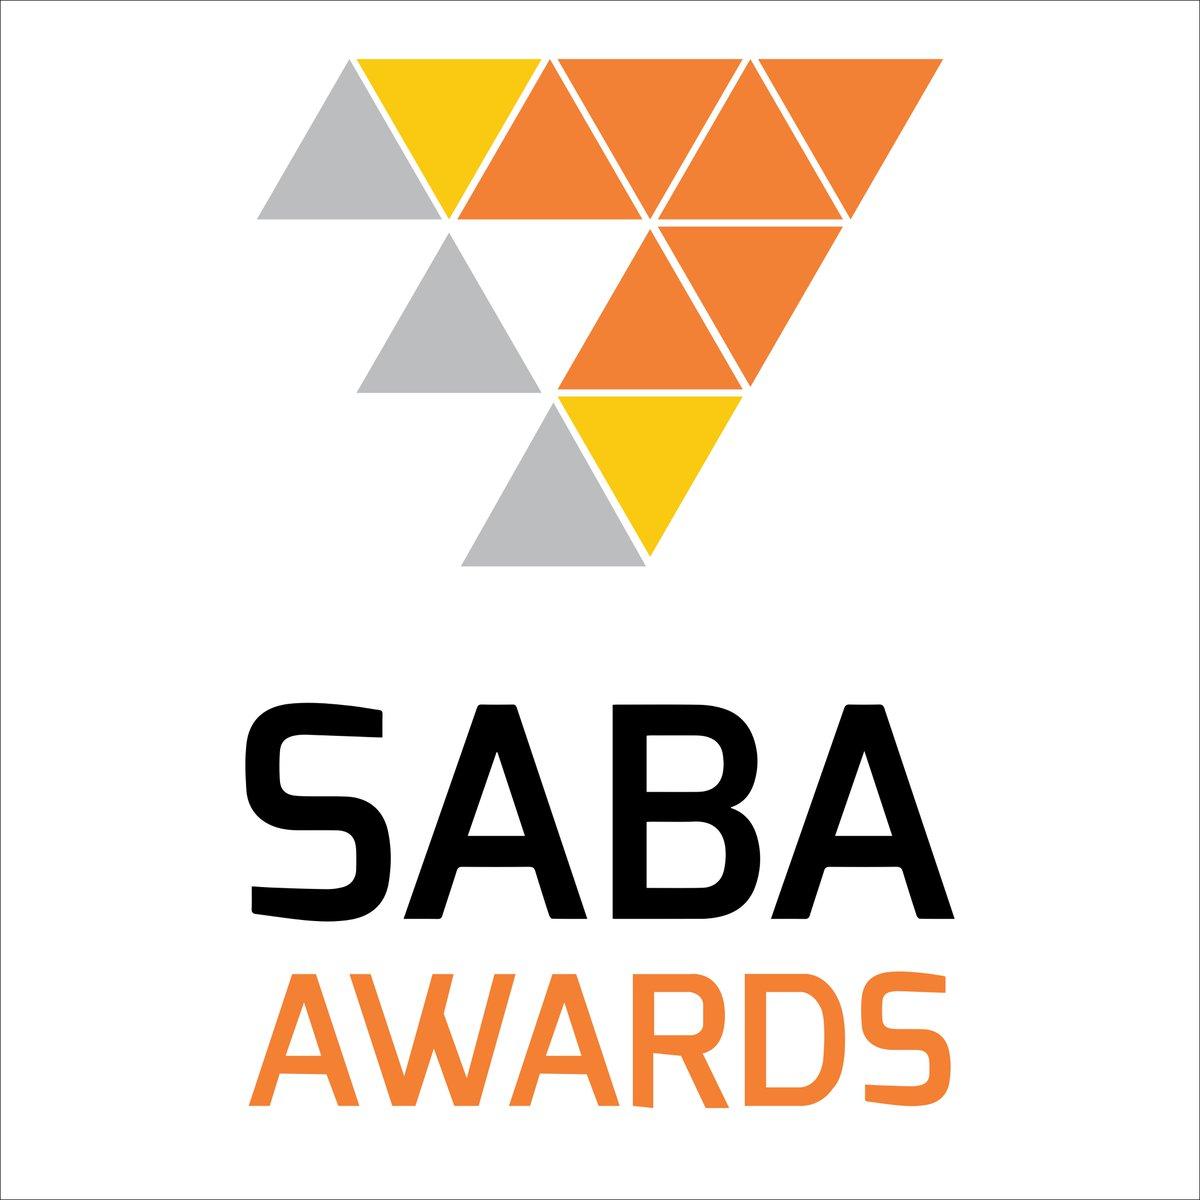 SABA Awards Encourages Ease Of Doing Business In Somalia